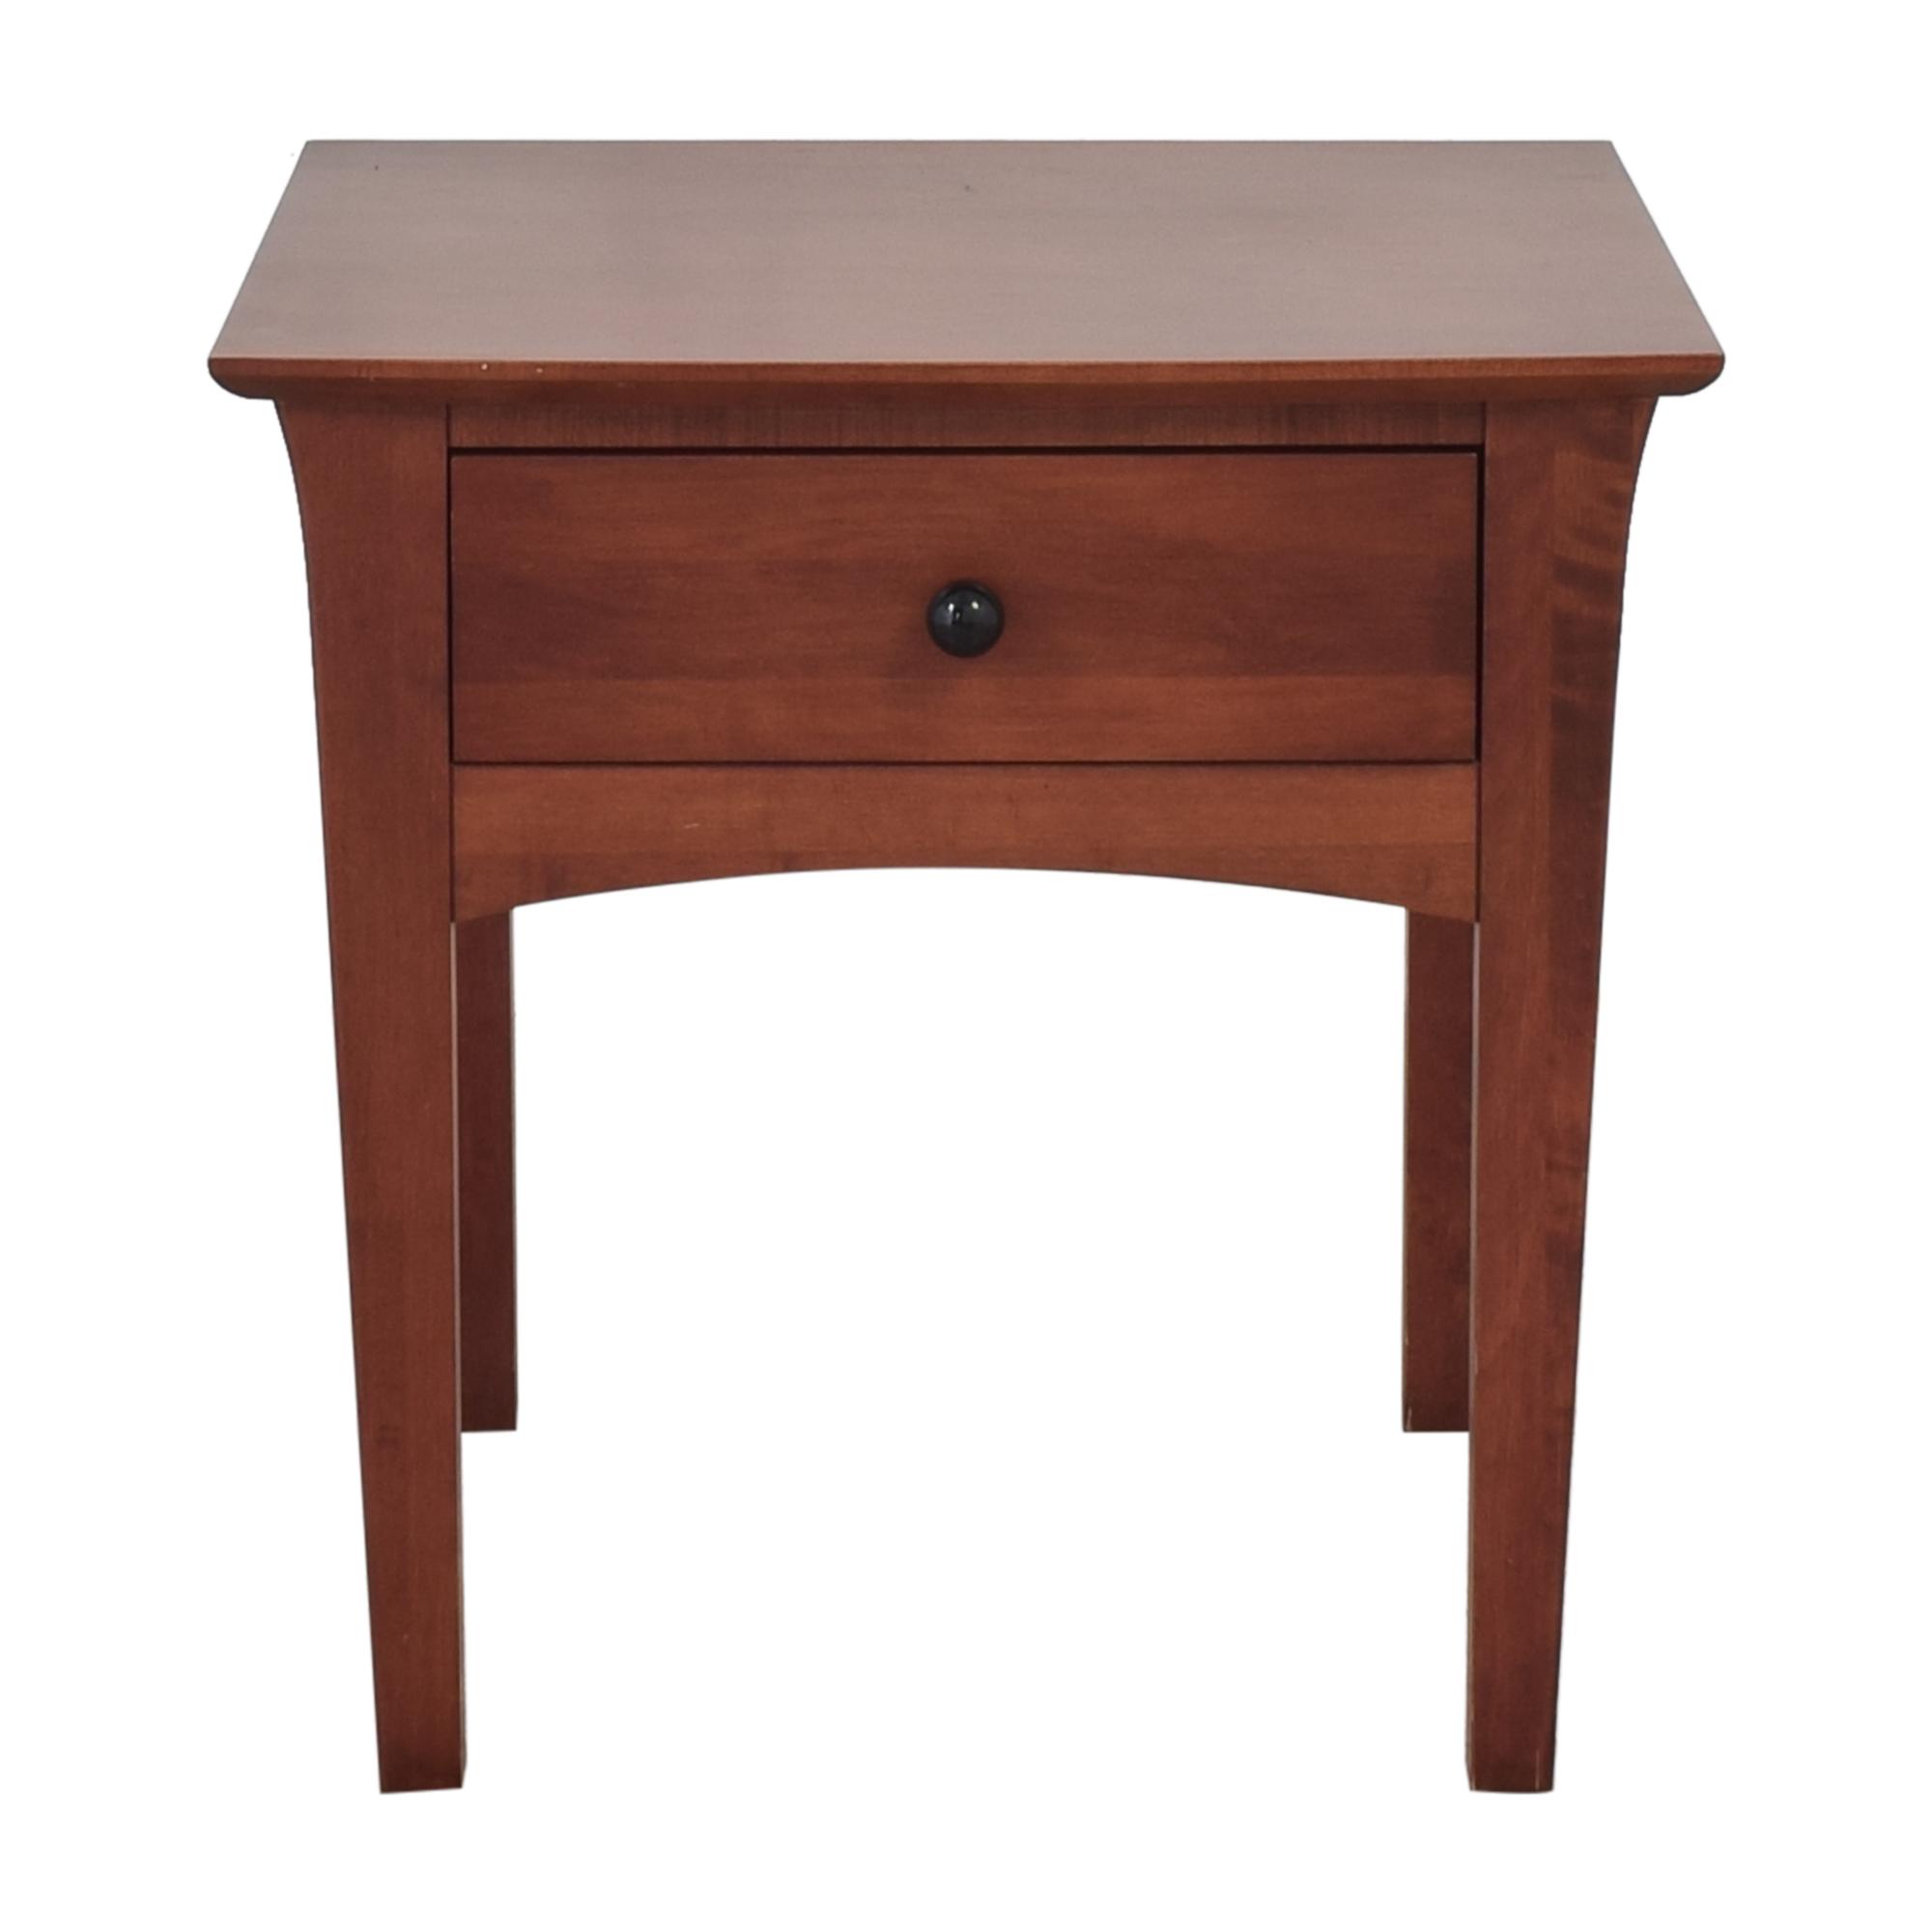 Baronet Baronet End Table